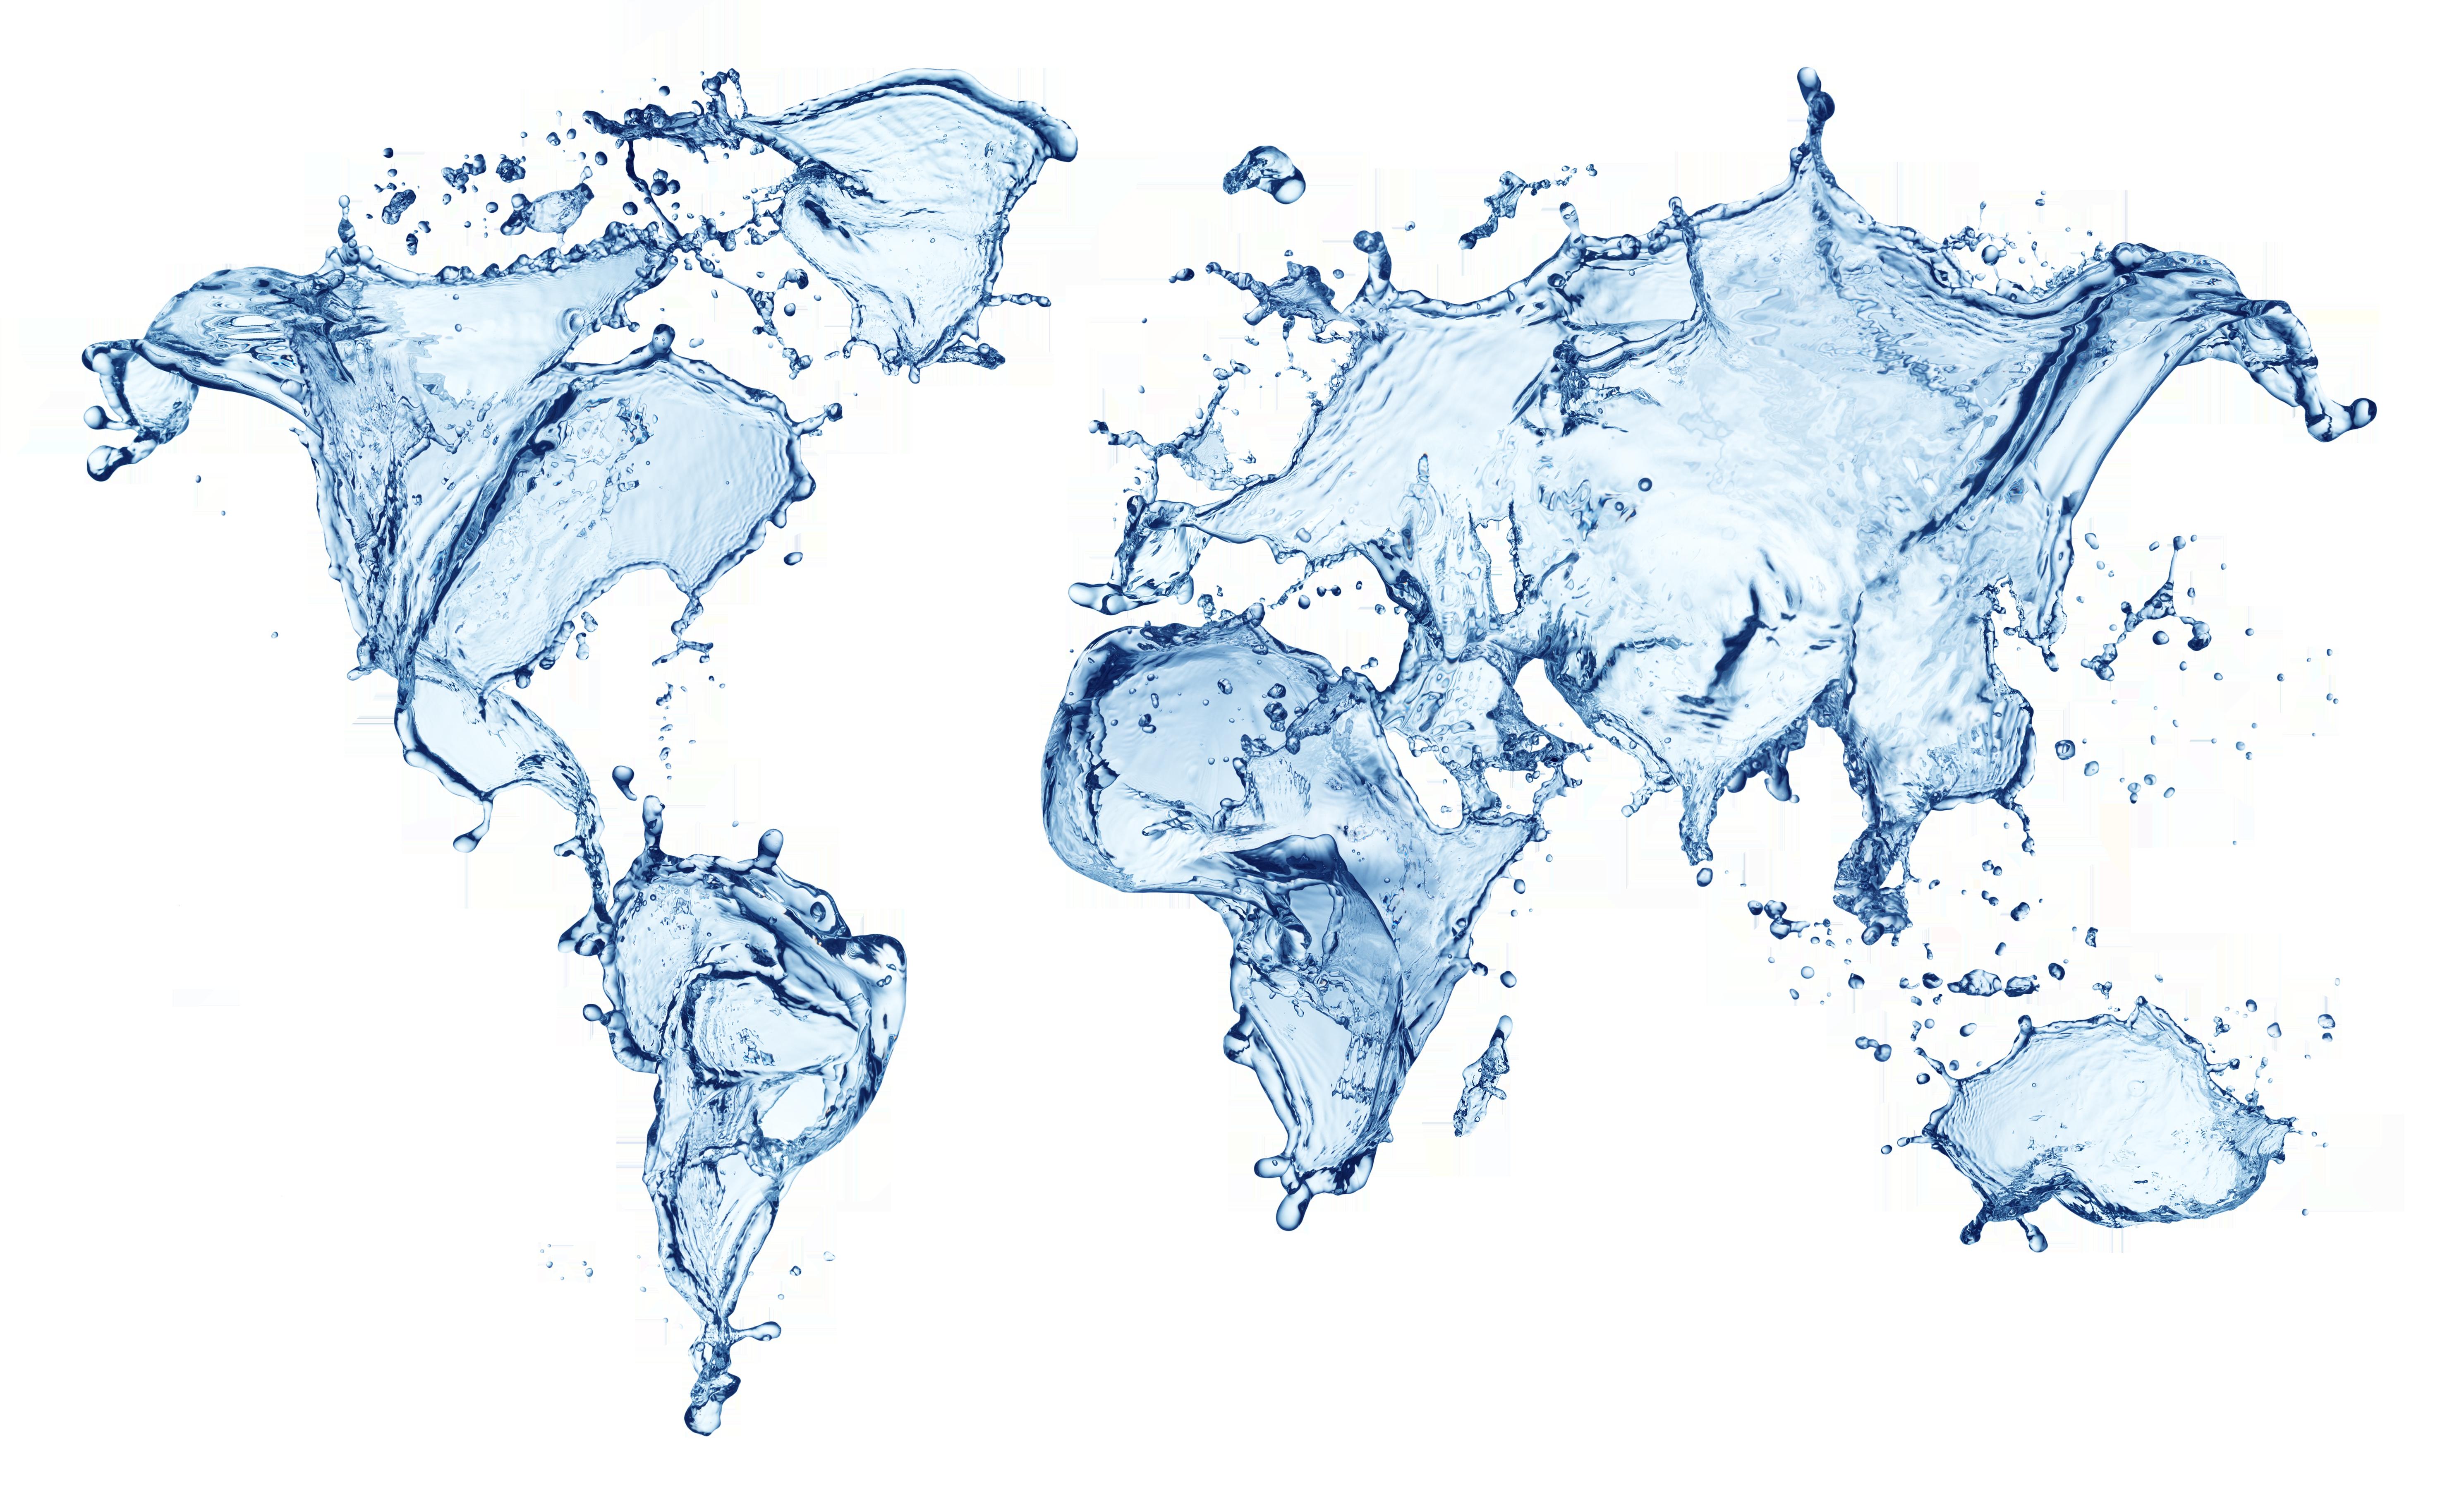 Water PNG image free Download